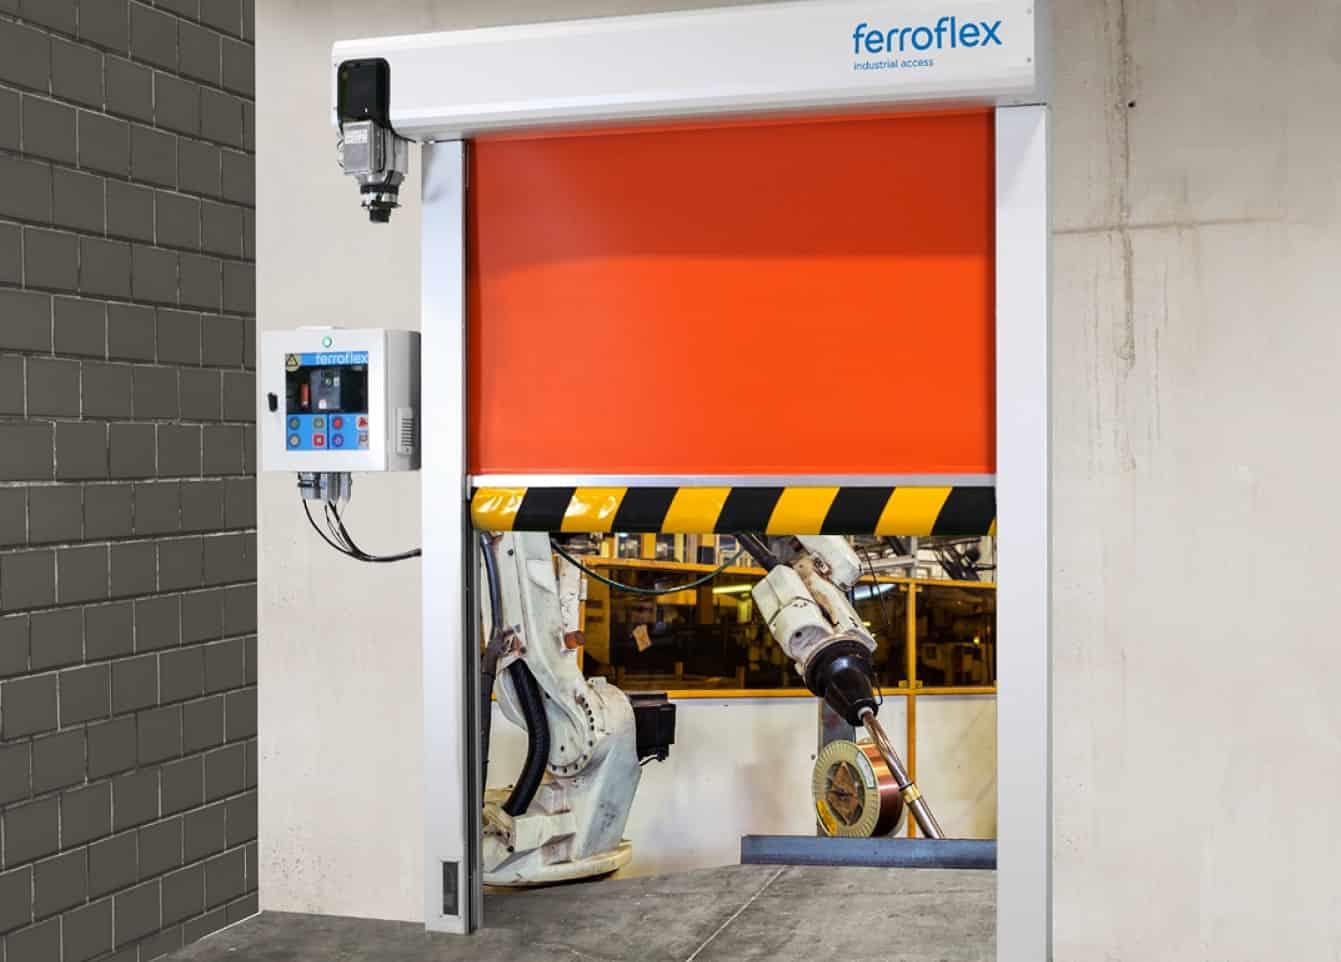 puerta-automatica-lineas-de-produccion-manusa-ferroflex-production-line-automatic-door industrial